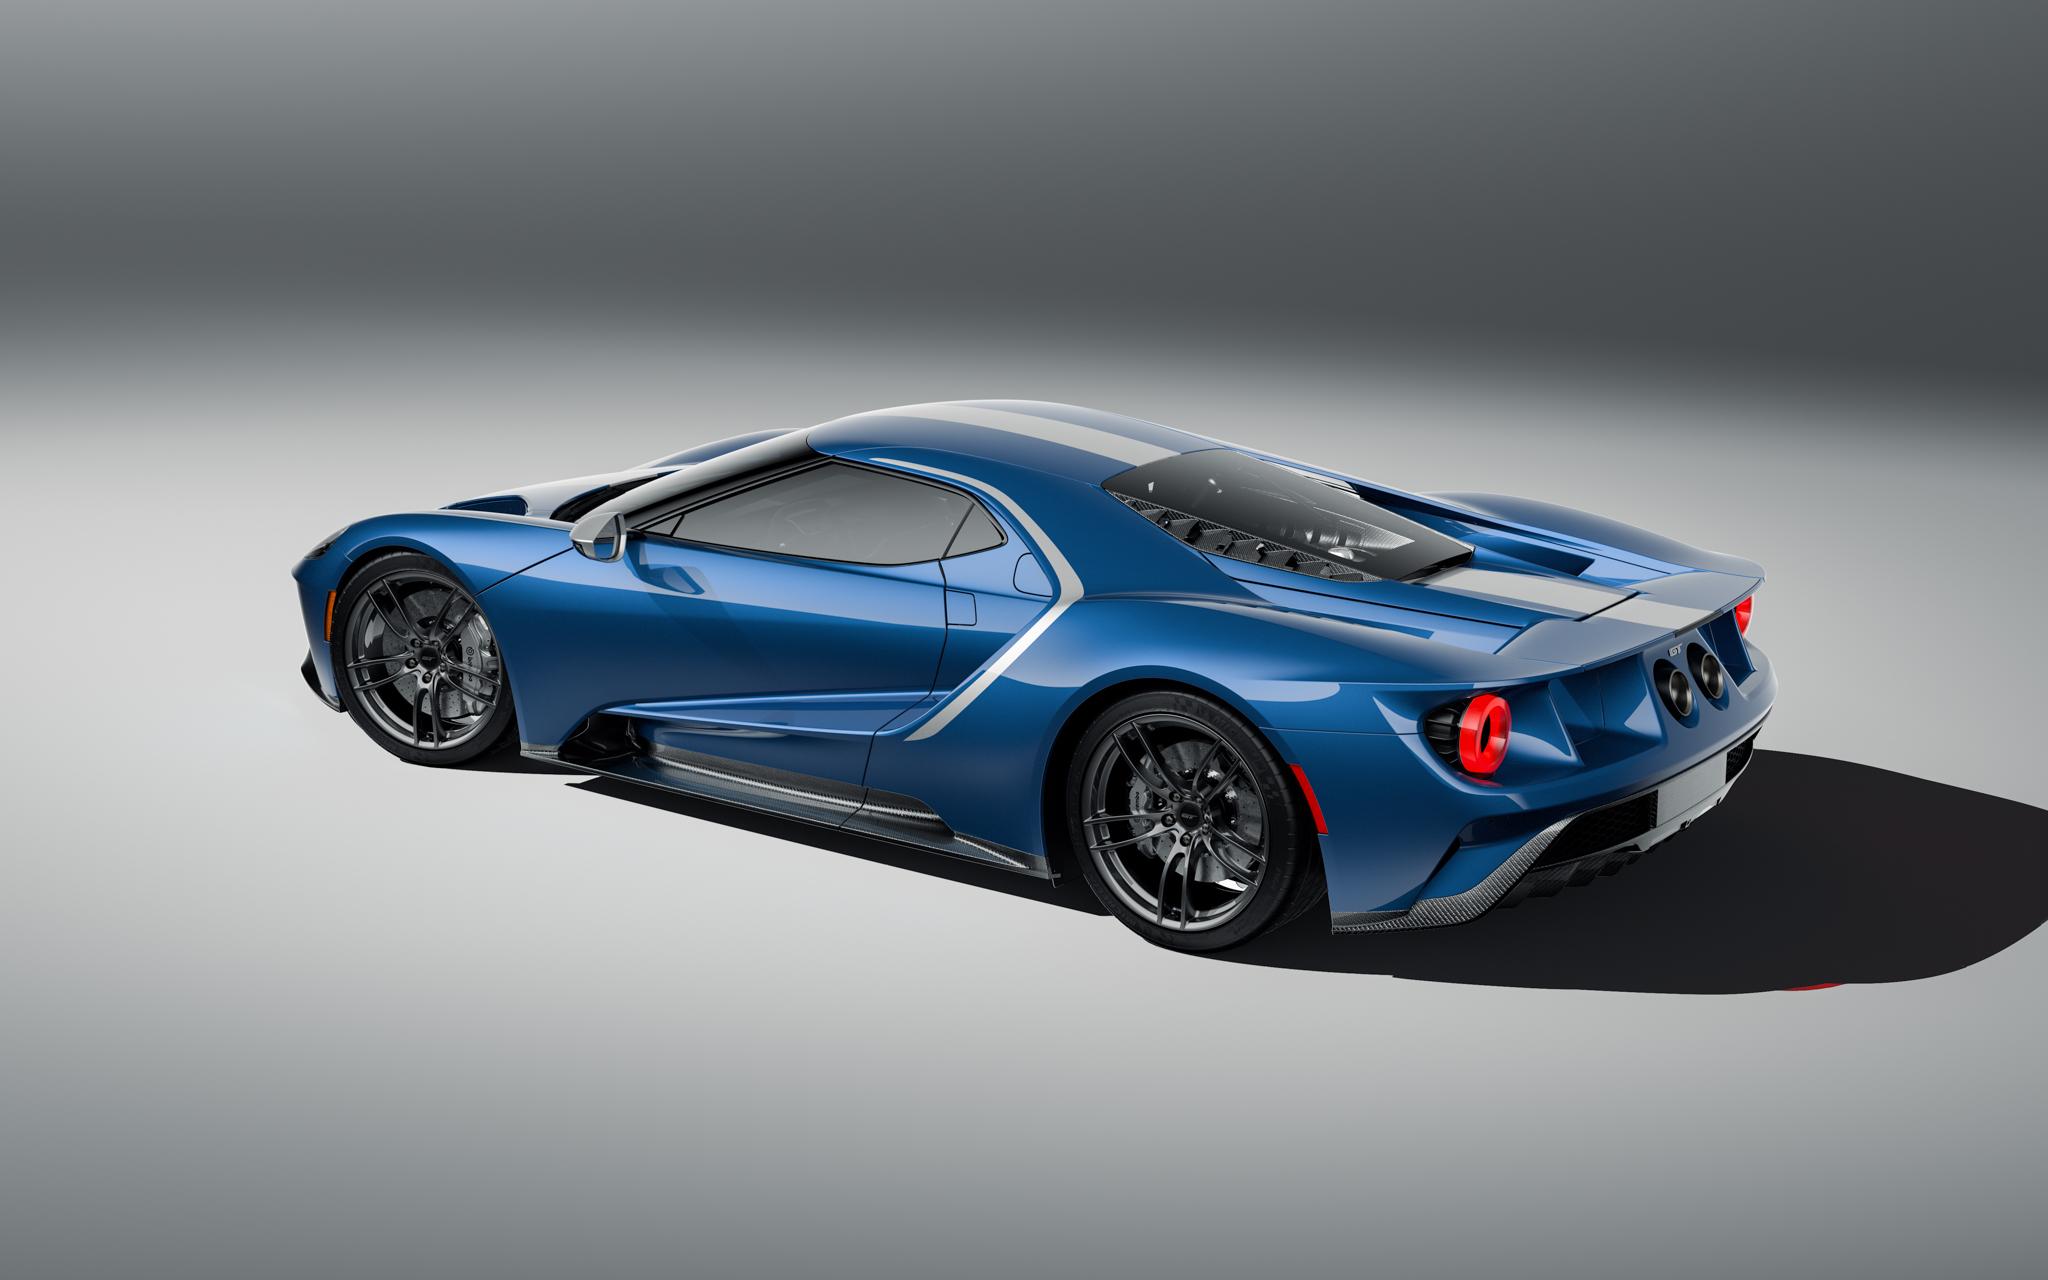 2021 Ford GT Studio Series rear three quarter